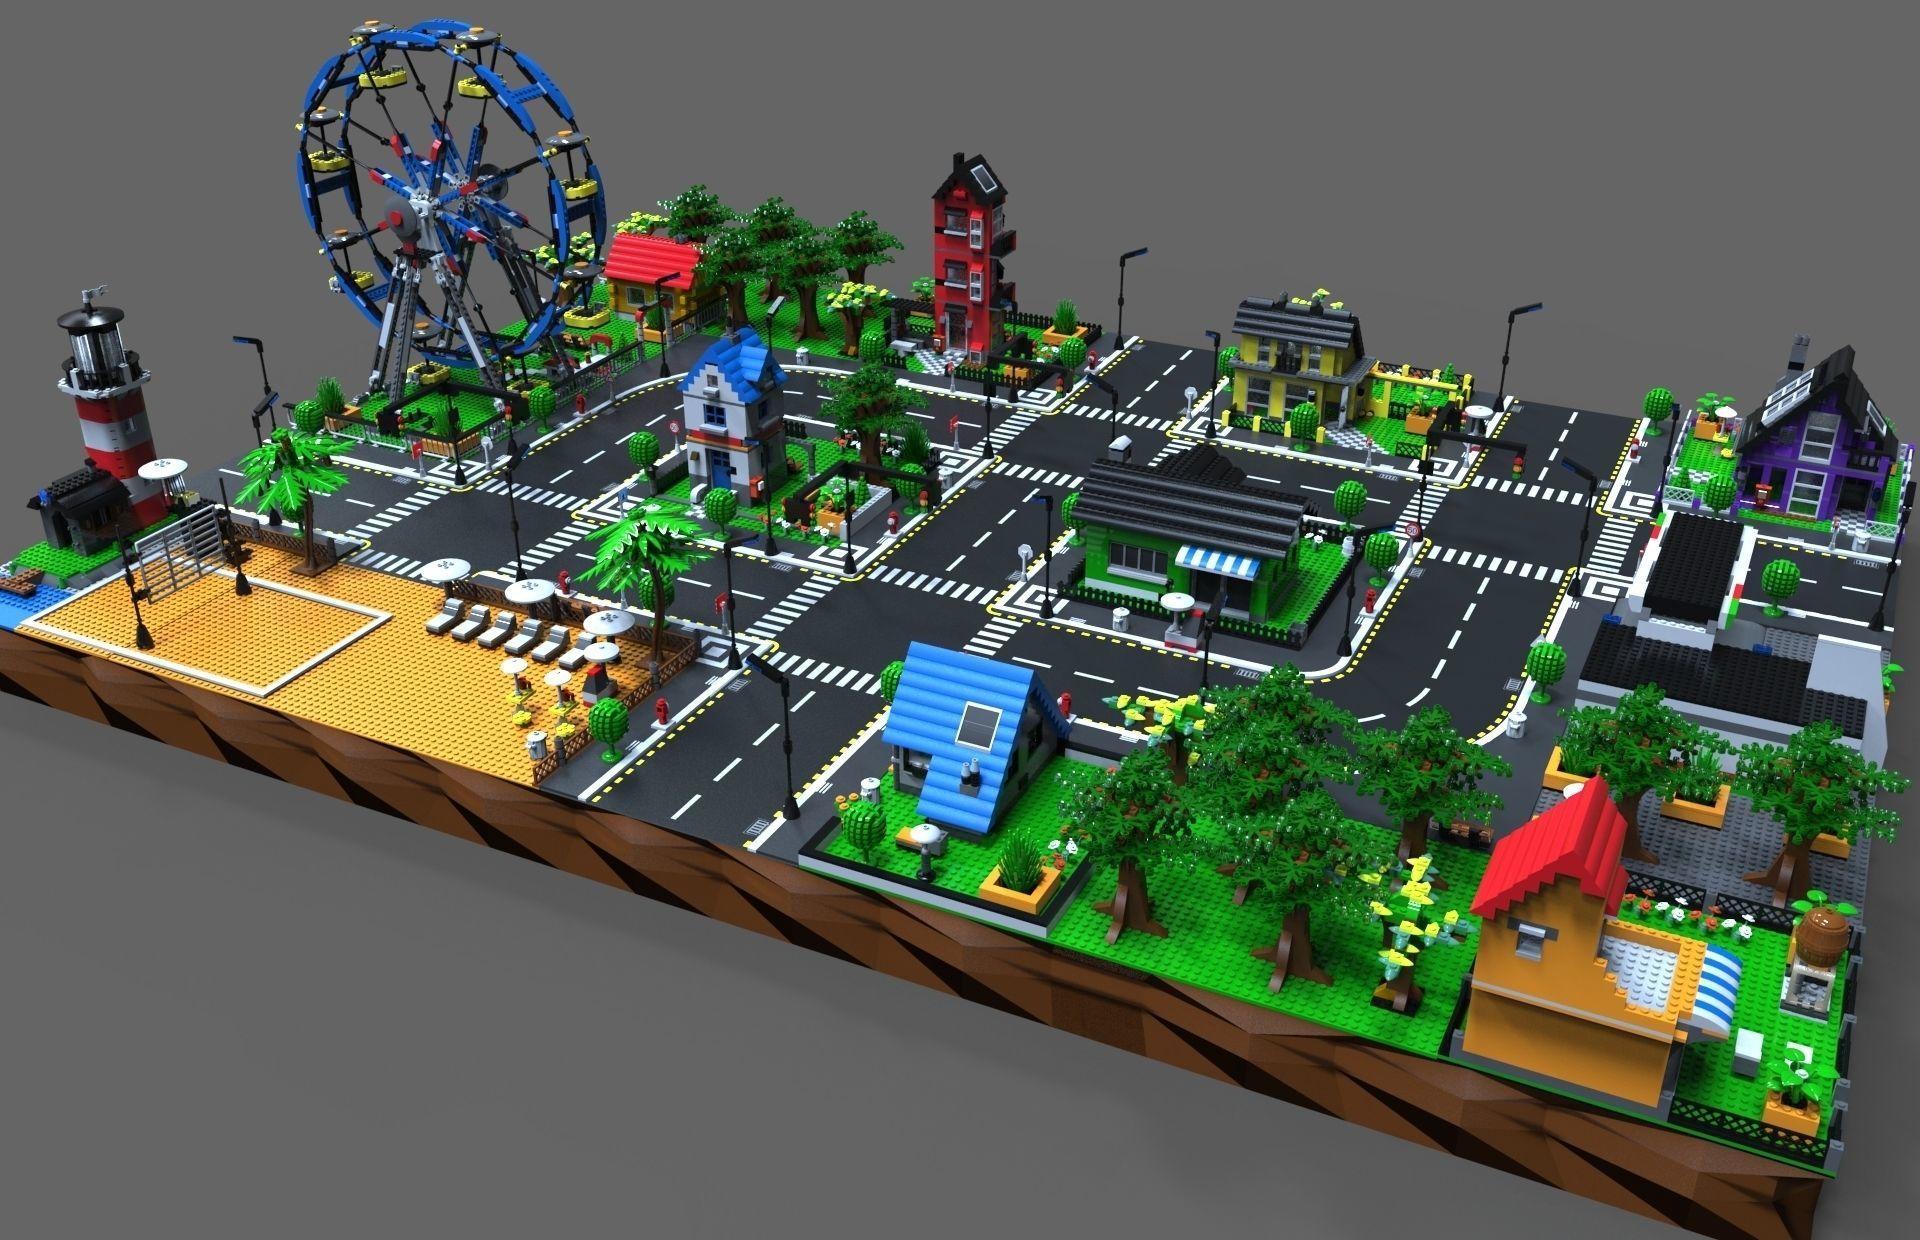 Lego City game by Vladim00719 | 3DOcean